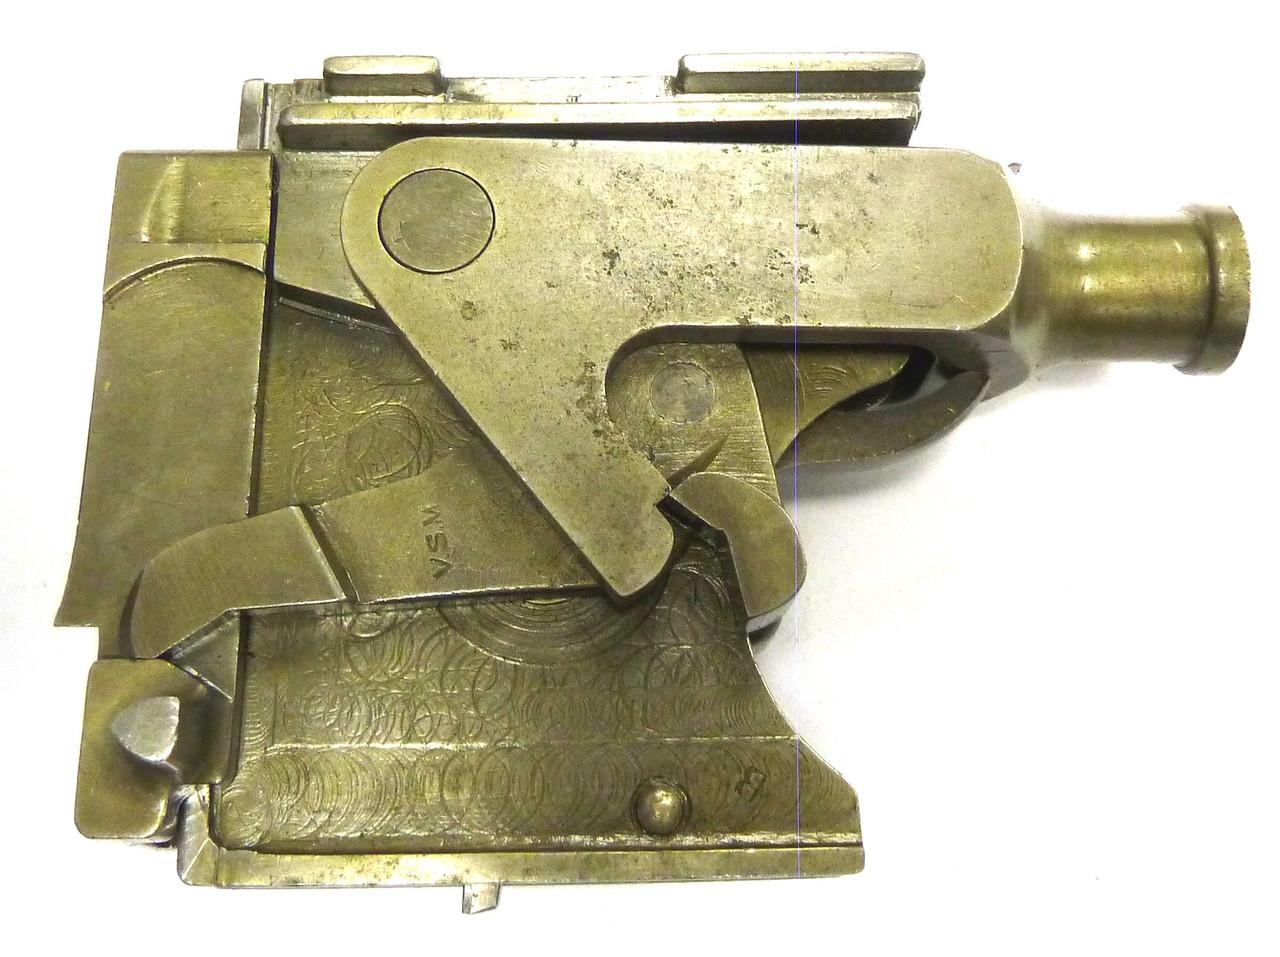 Vickers Lock Assembly - VSM - good+ cond., w/extra lock spring